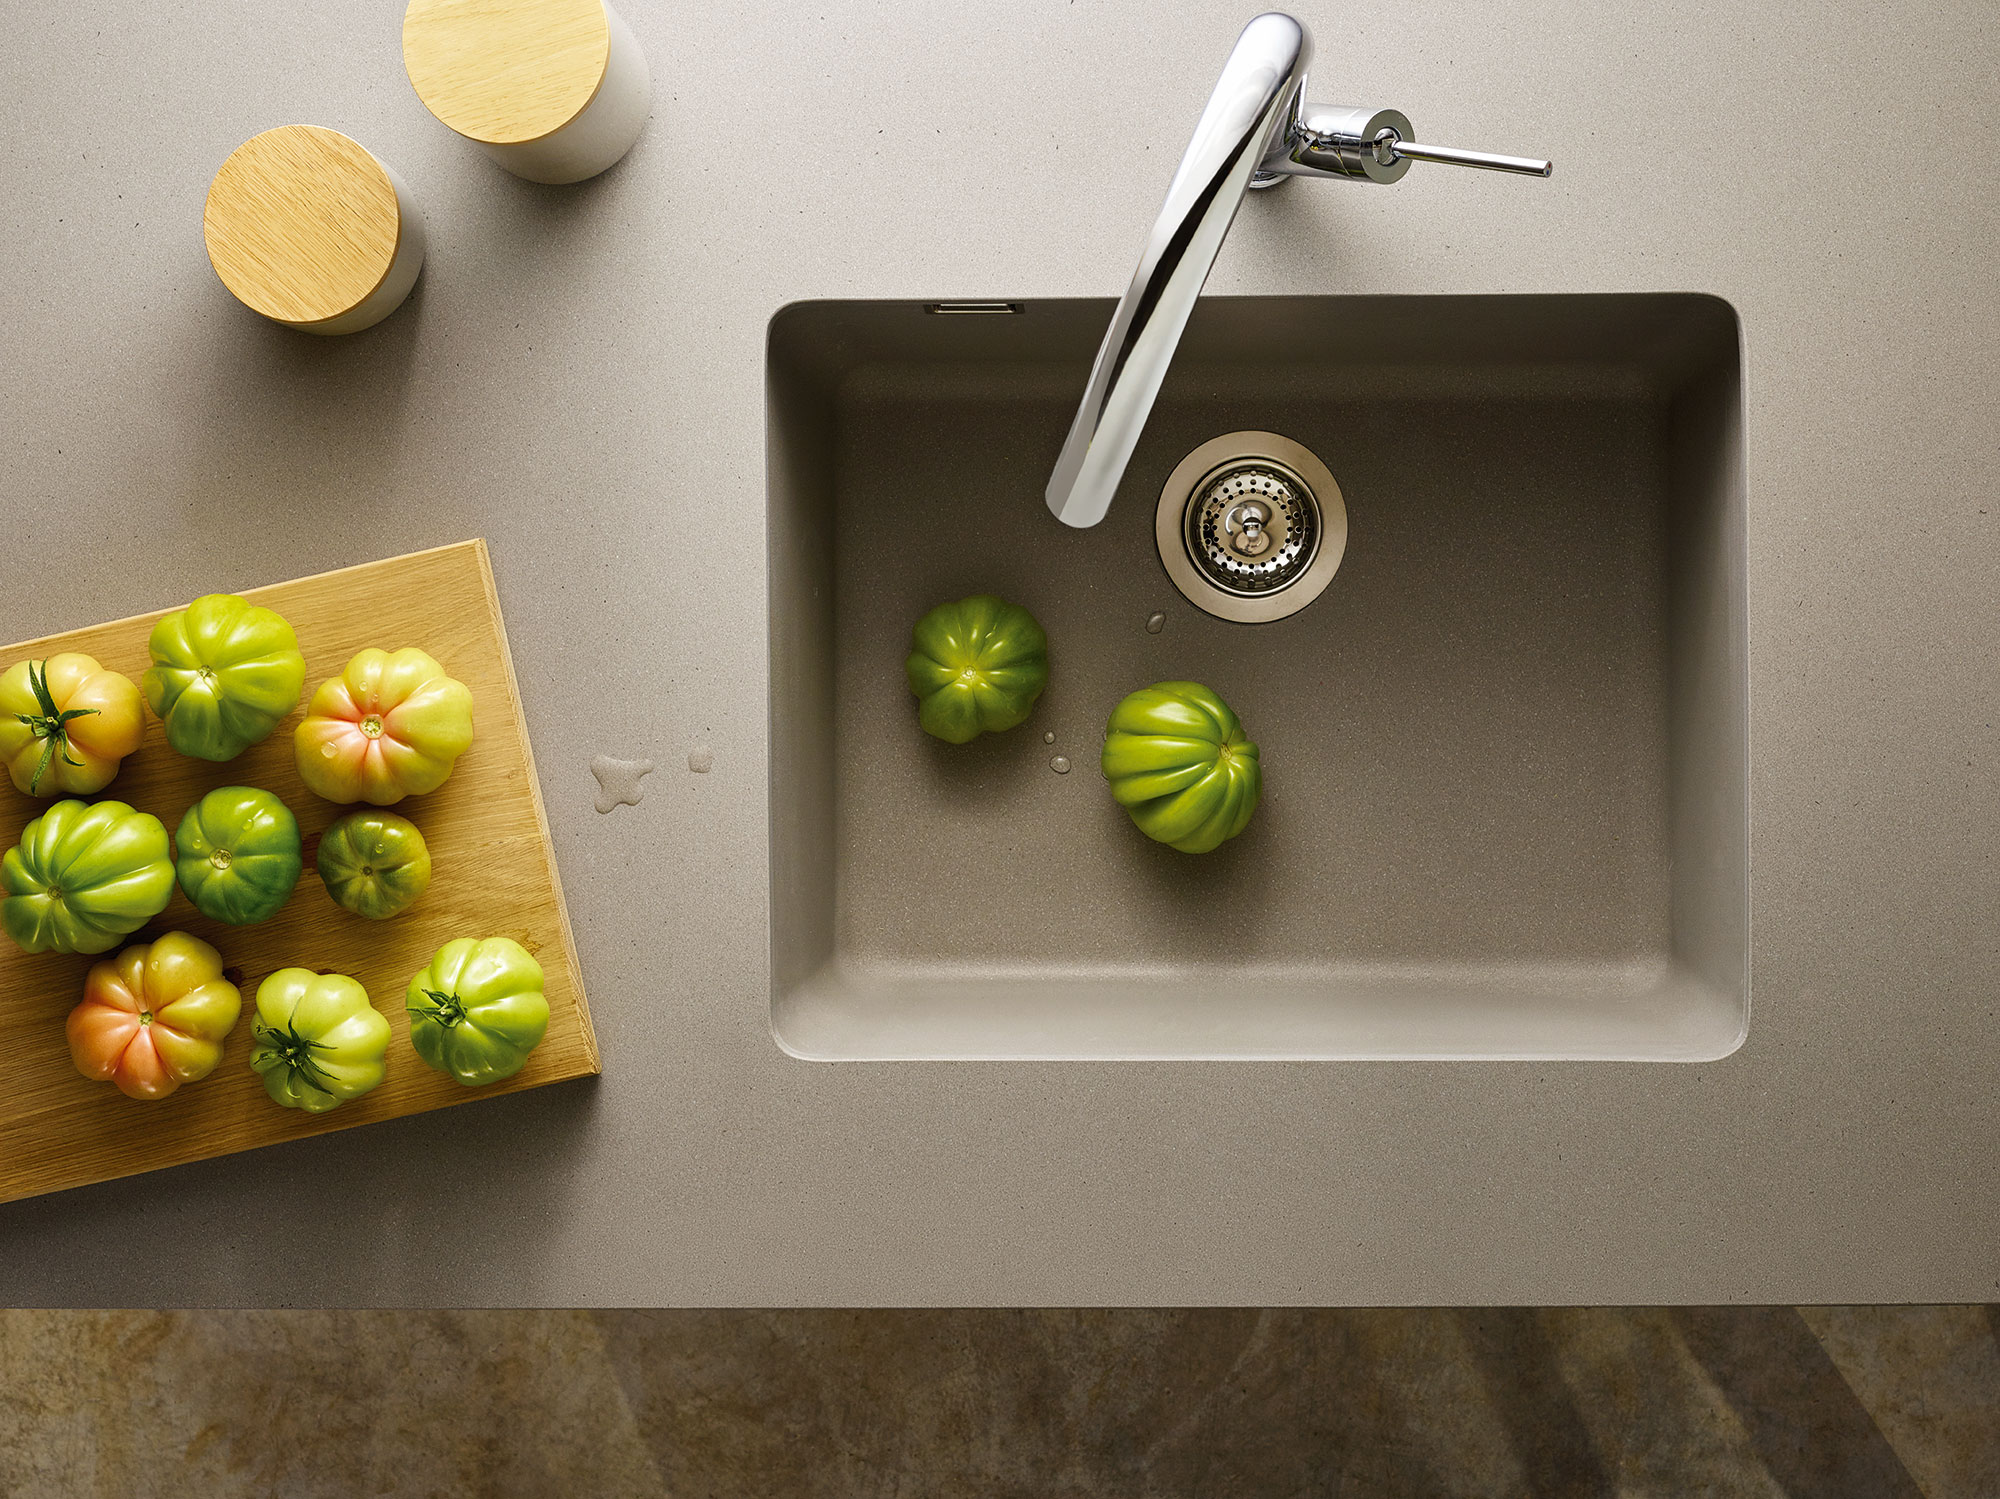 Limited Edition Caesarstone Sinks